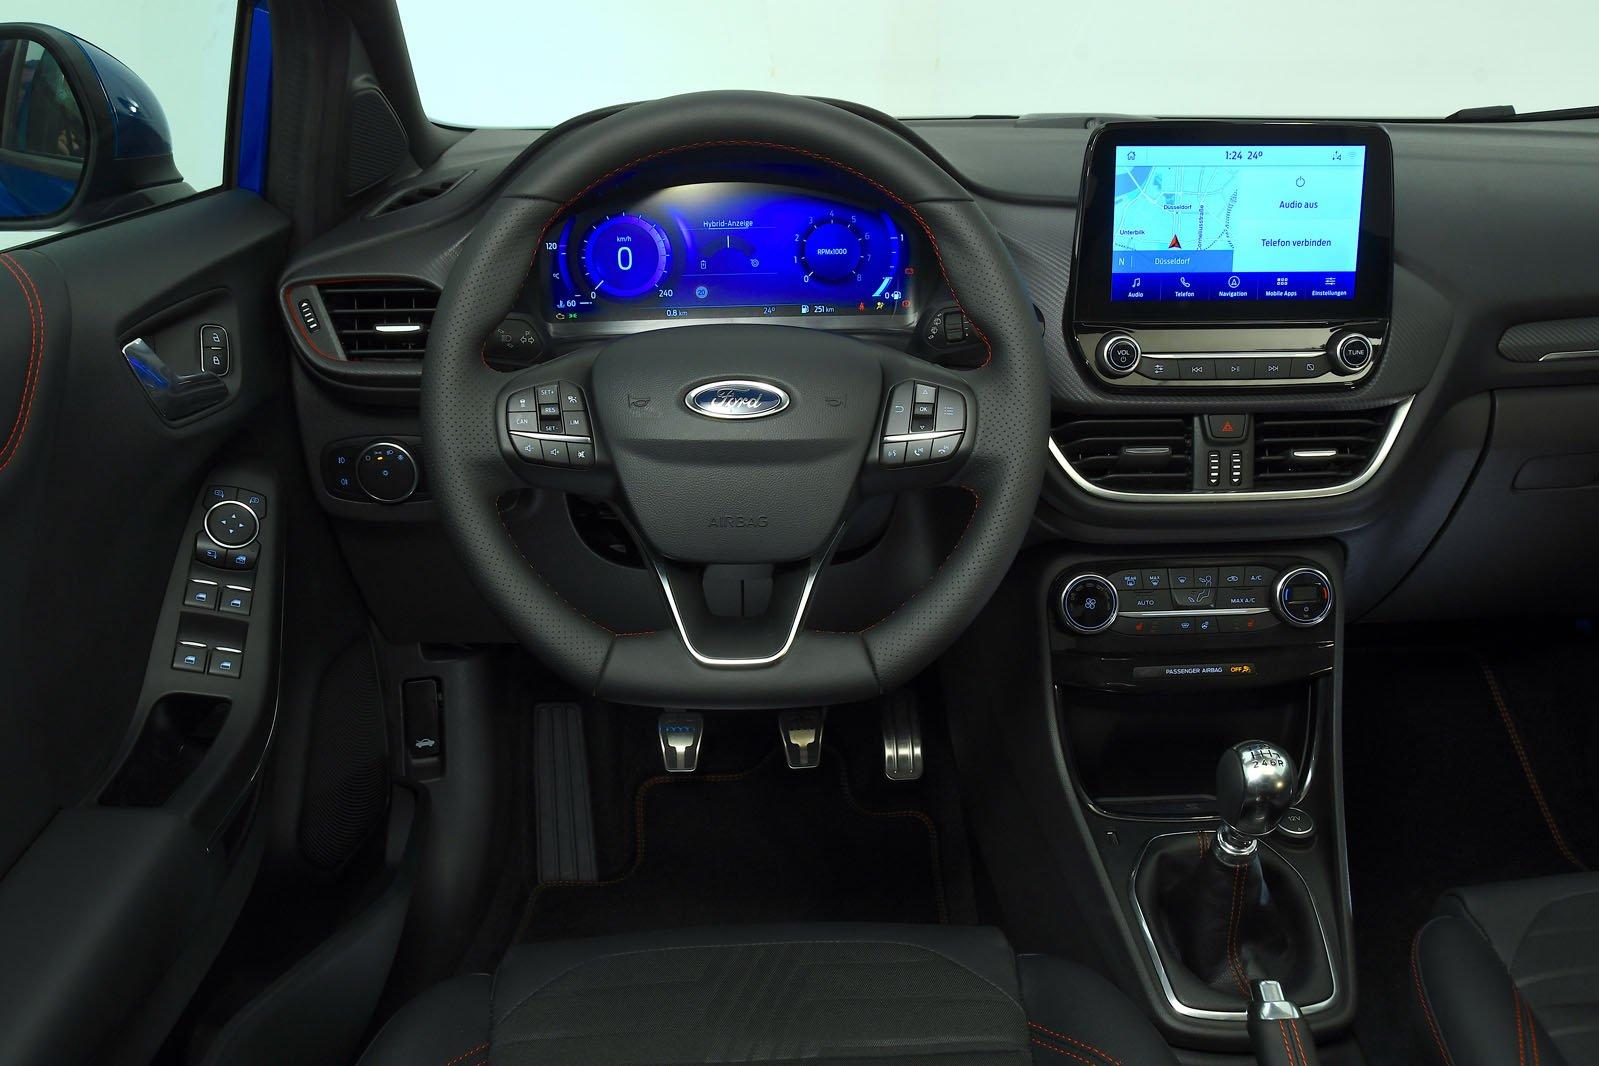 2019 Ford Puma interior